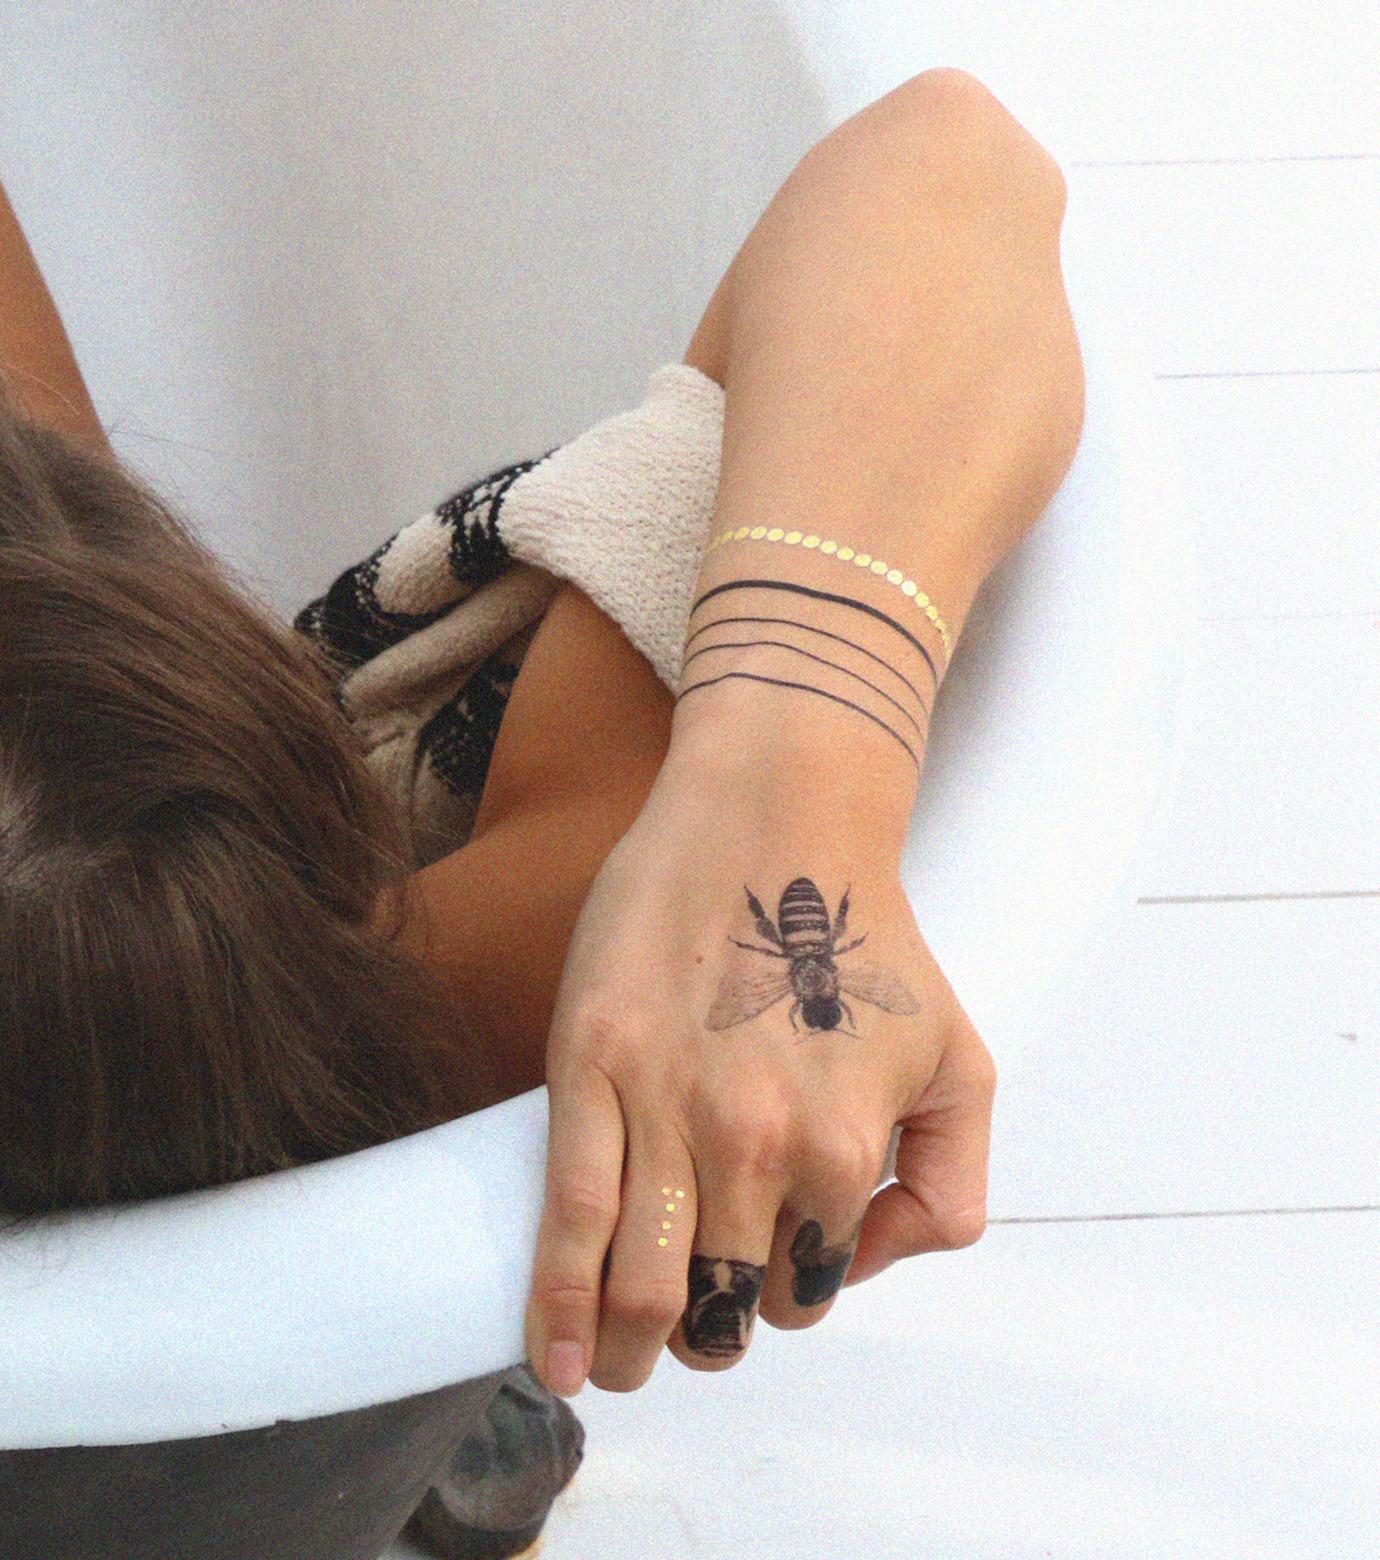 DCER(ディーシーイーアール)のBulldogs Tattoo-BLACK(MAKE-UP/MAKE-UP)-FW15004-13 拡大詳細画像2